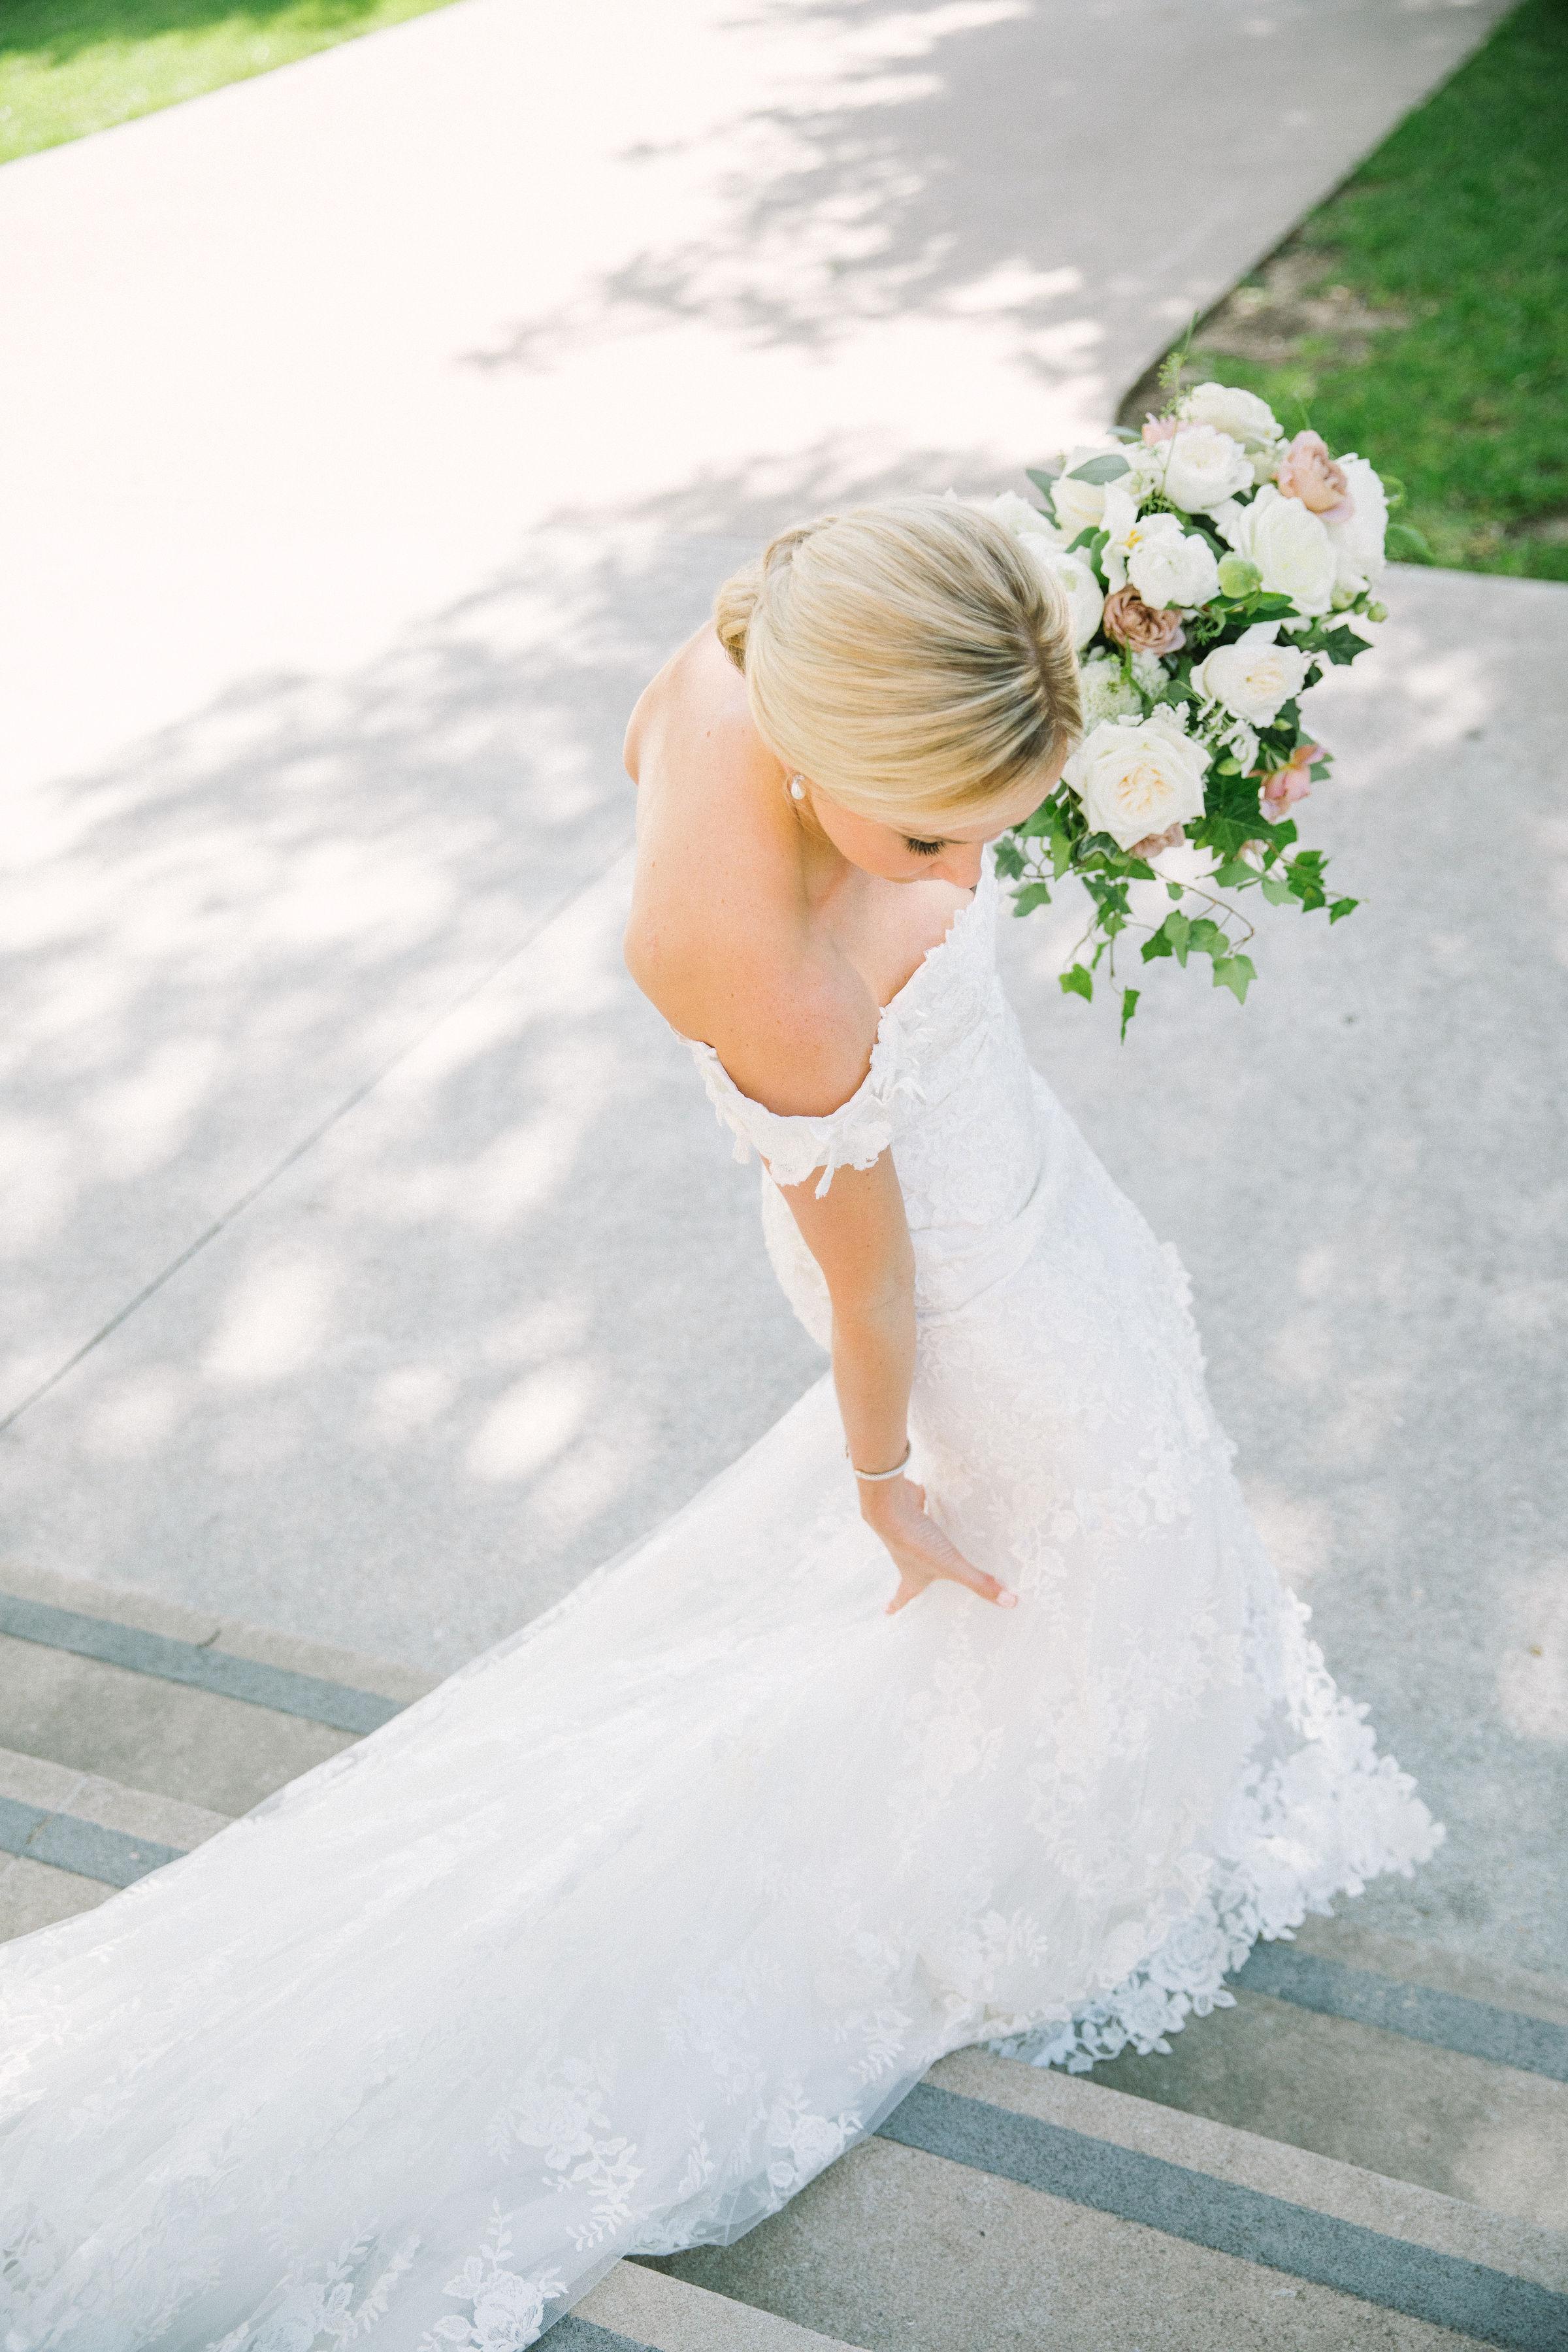 Ellen-Ashton-Photography-Girt-and-gold-events-weddings-Ashton-Depot-Weddings157.jpg